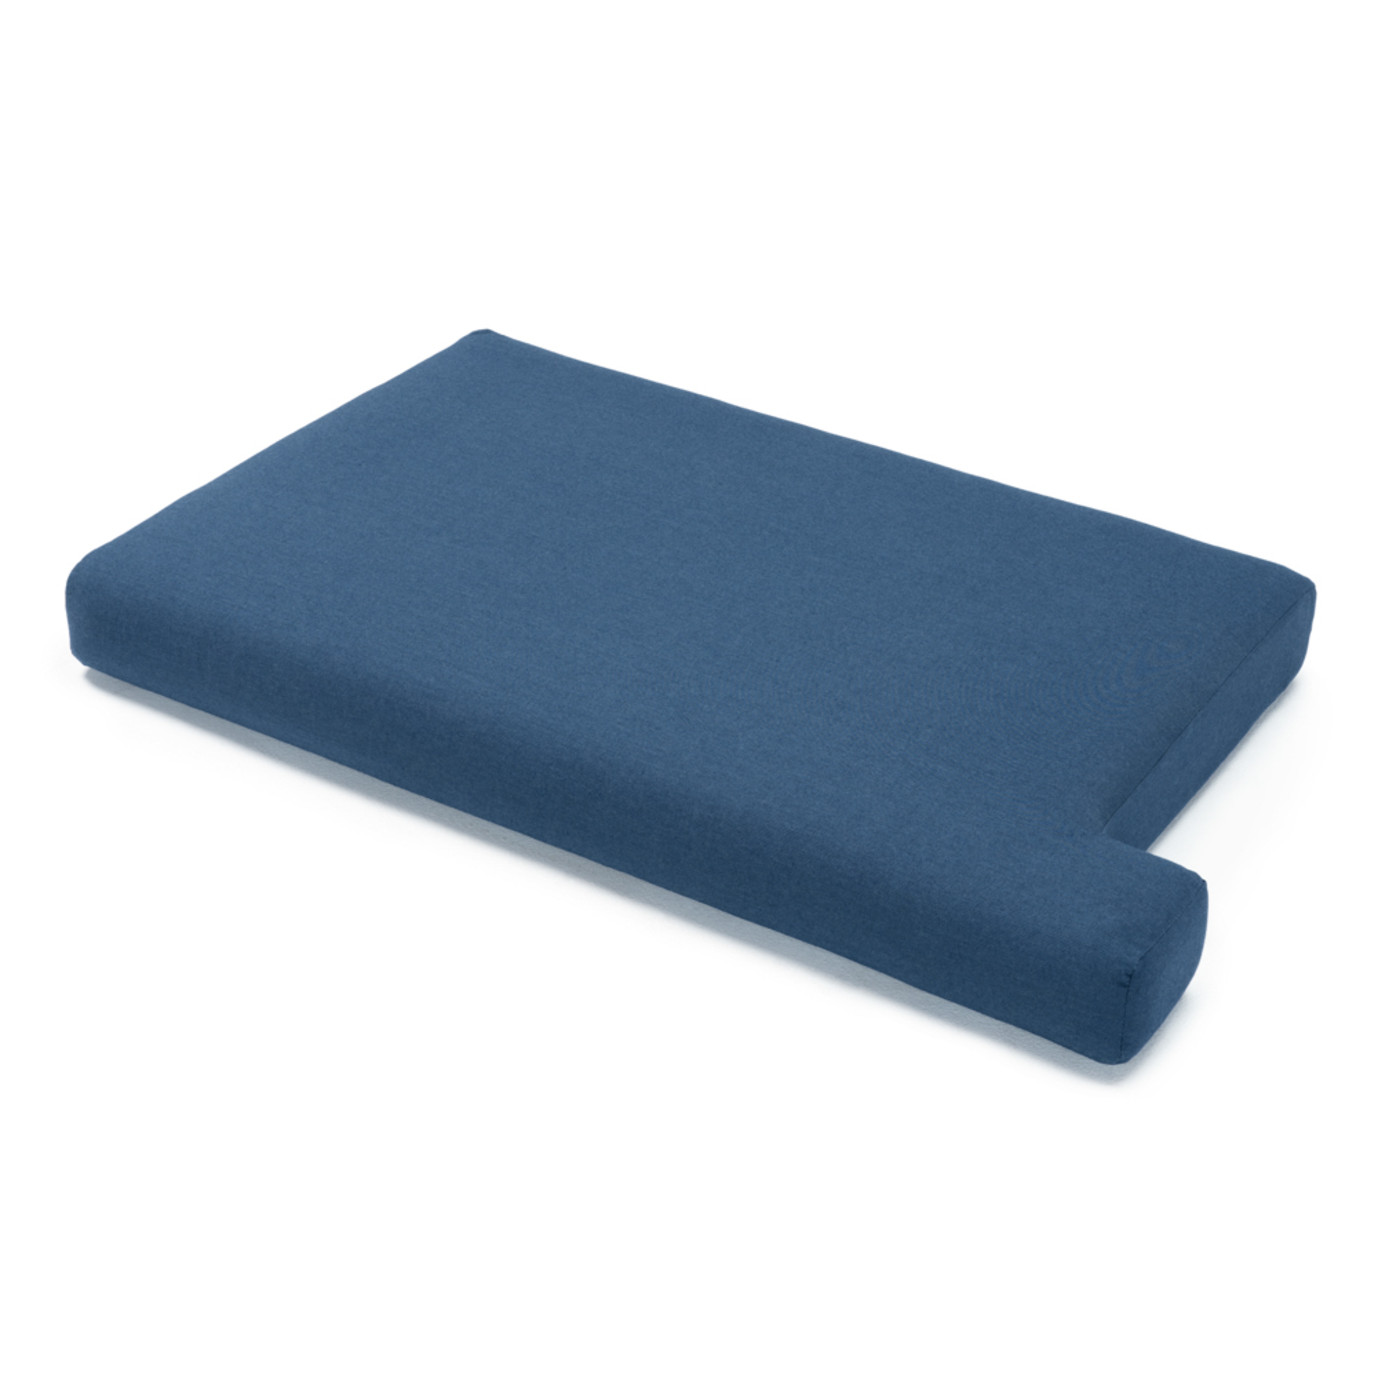 Portofino Comfort 96in Sofa Left Base Cushion - Laguna Blue